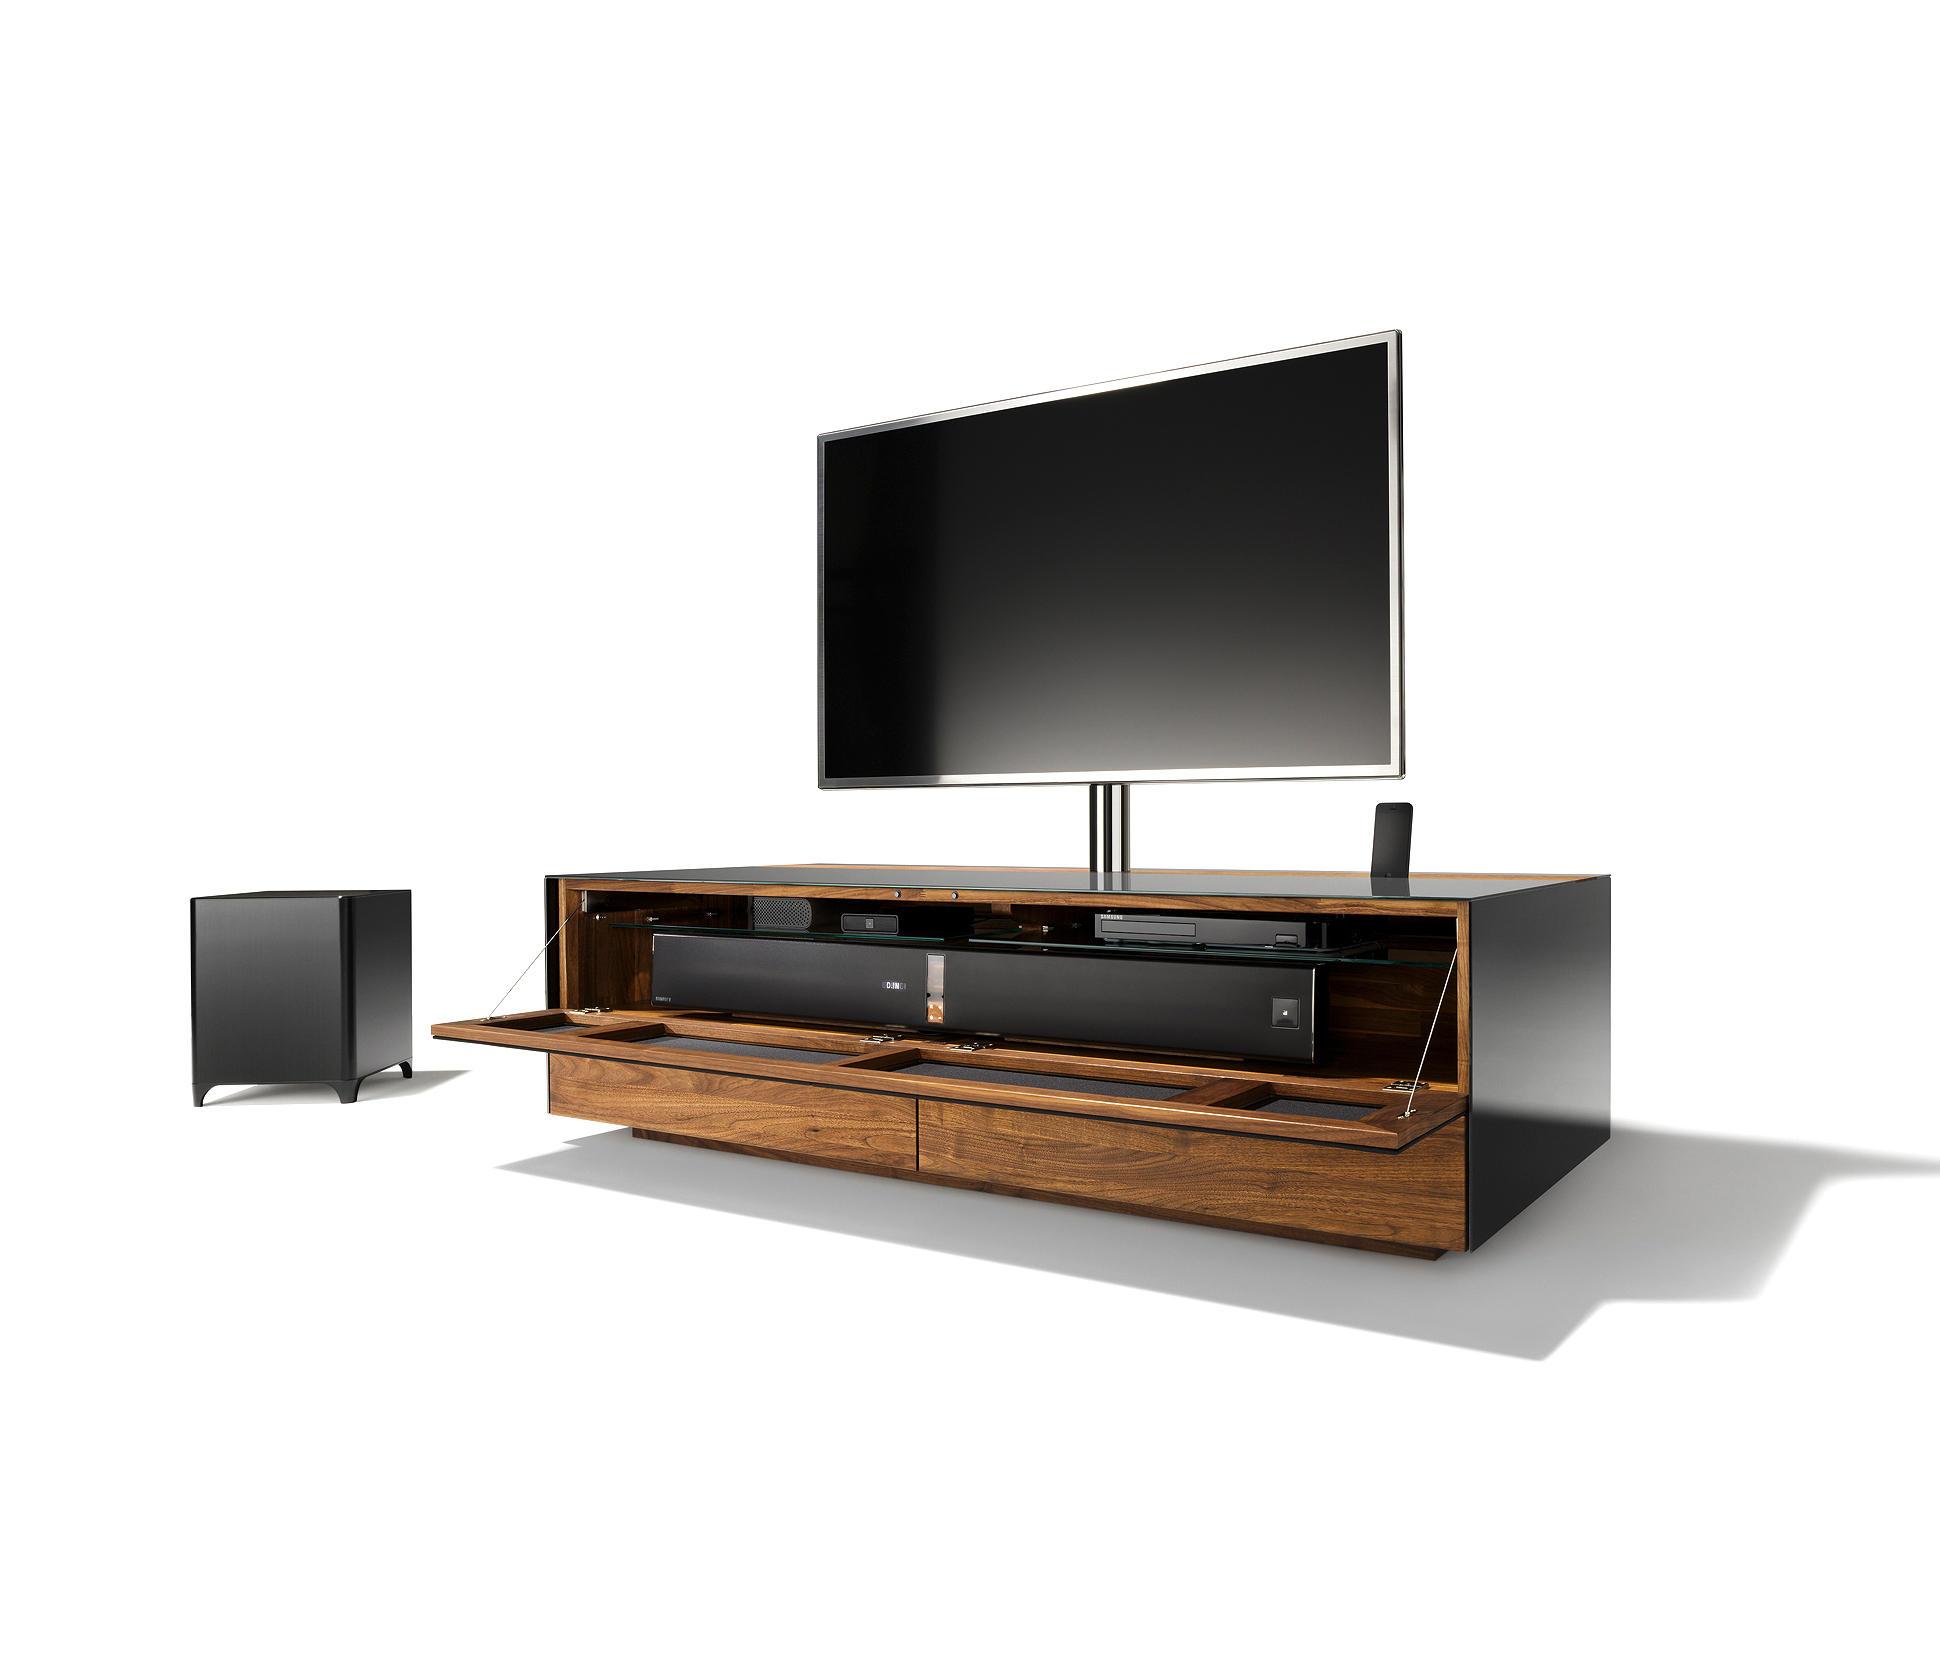 tv board glas perfect tv mobel schwarz weiss steel tv tv board in wei schwarz glas with tv. Black Bedroom Furniture Sets. Home Design Ideas